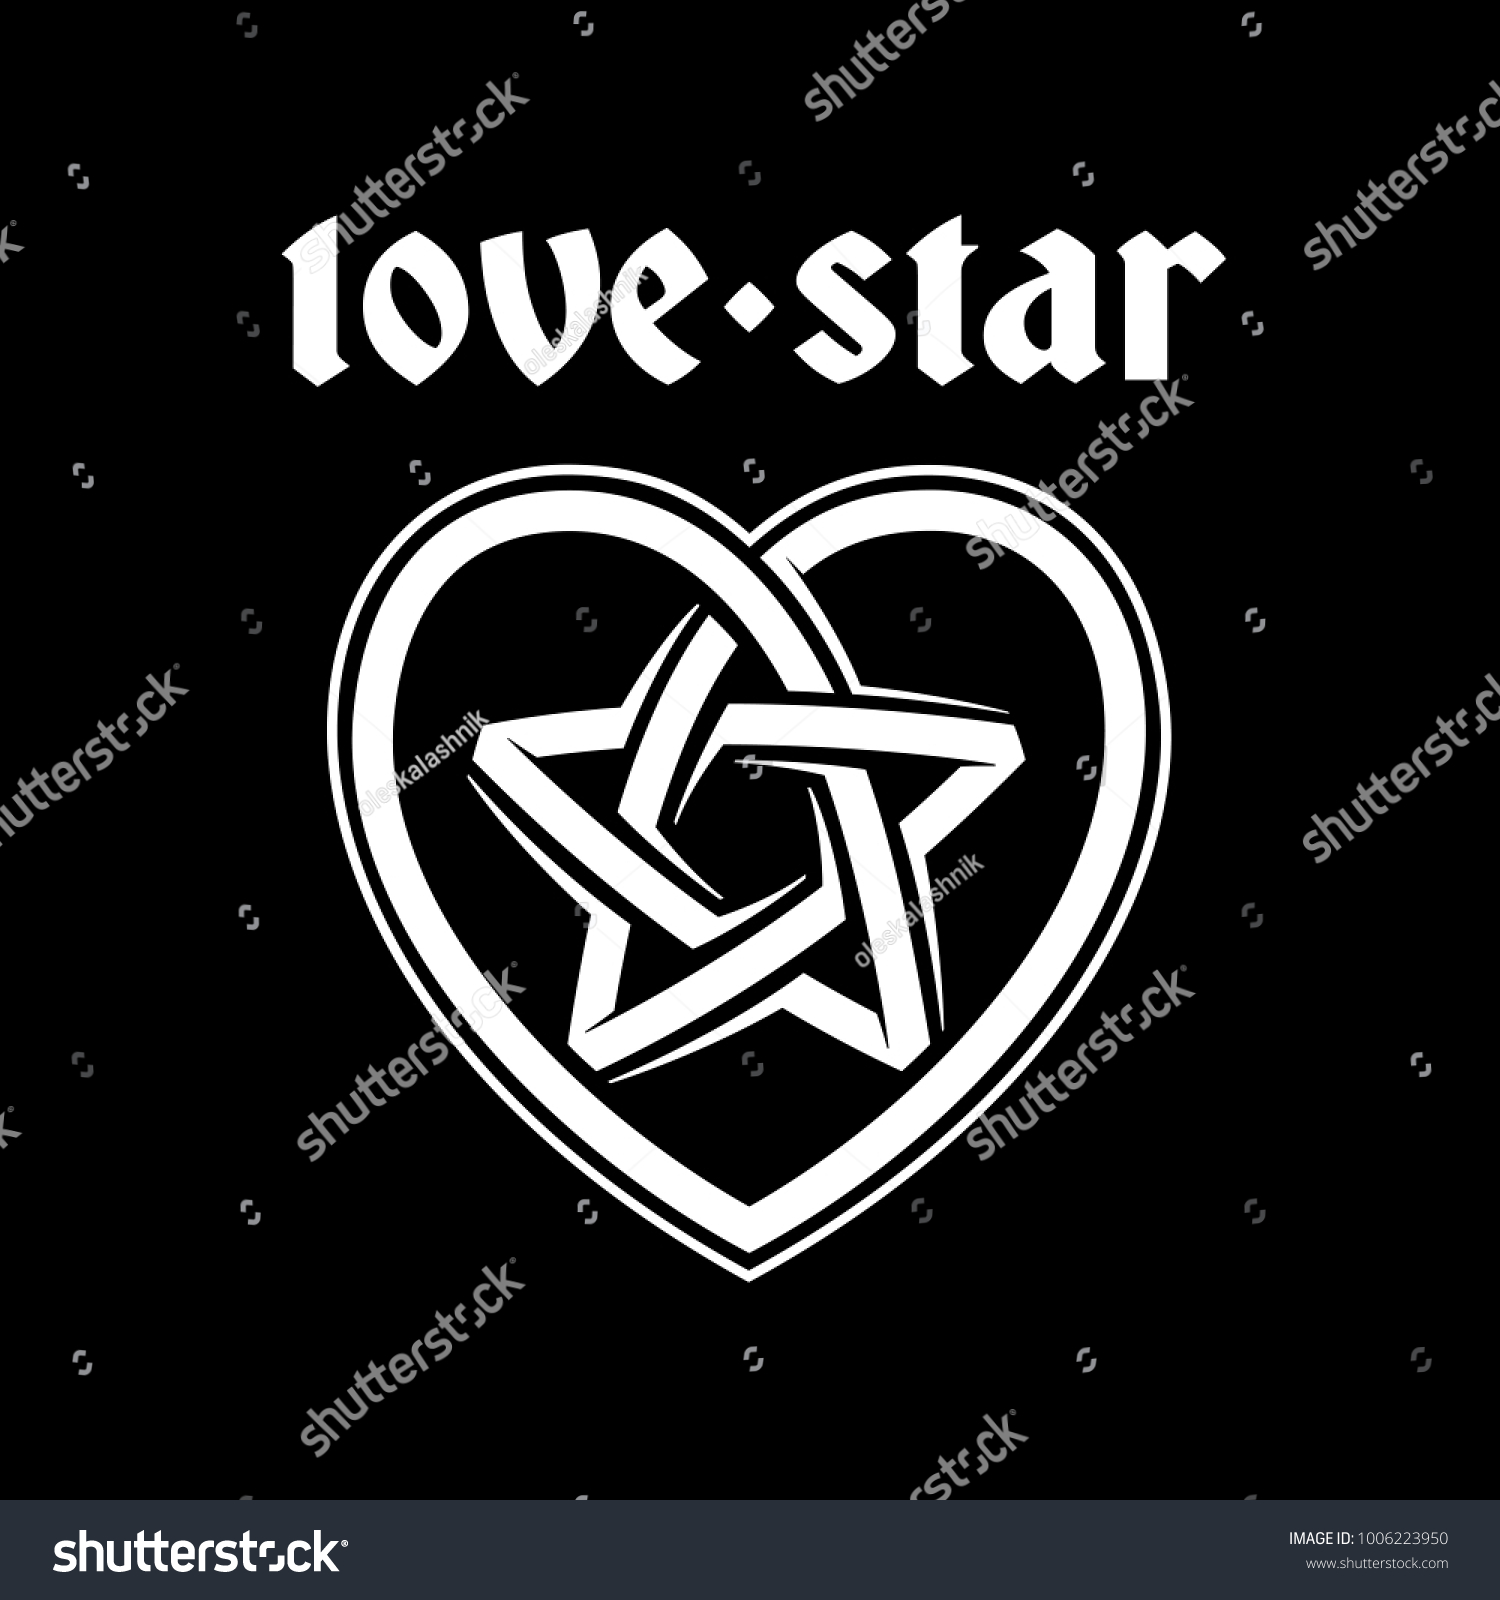 Love Star Vector Logo White Interwoven Star Stock Vector Royalty